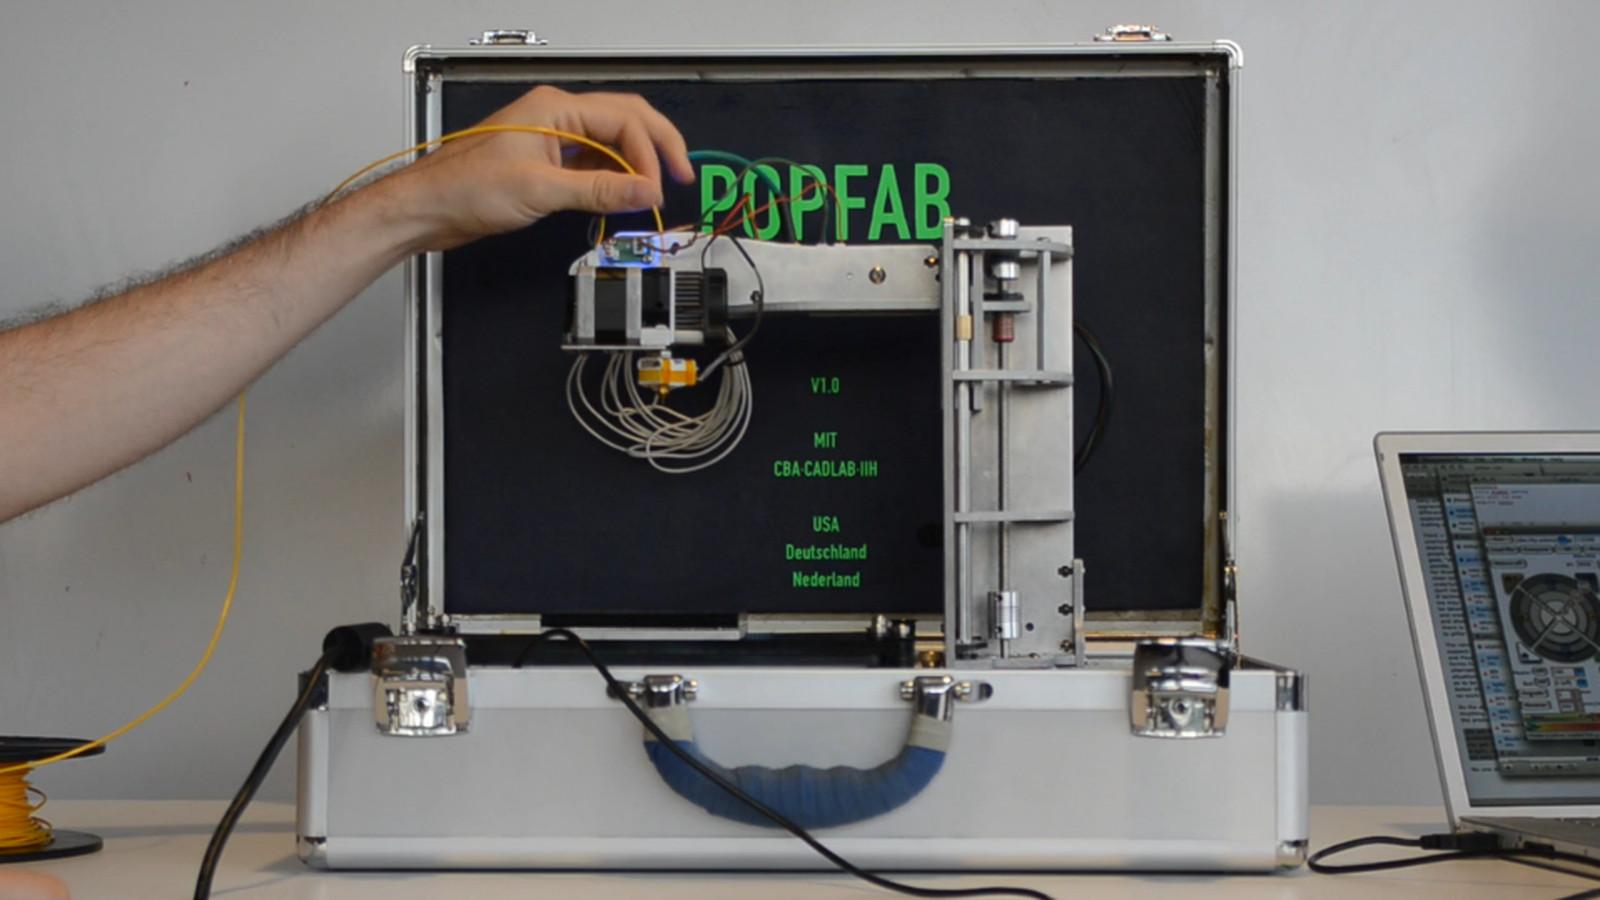 Popfab A 3d Printer And Cnc Milling Machine That Fits